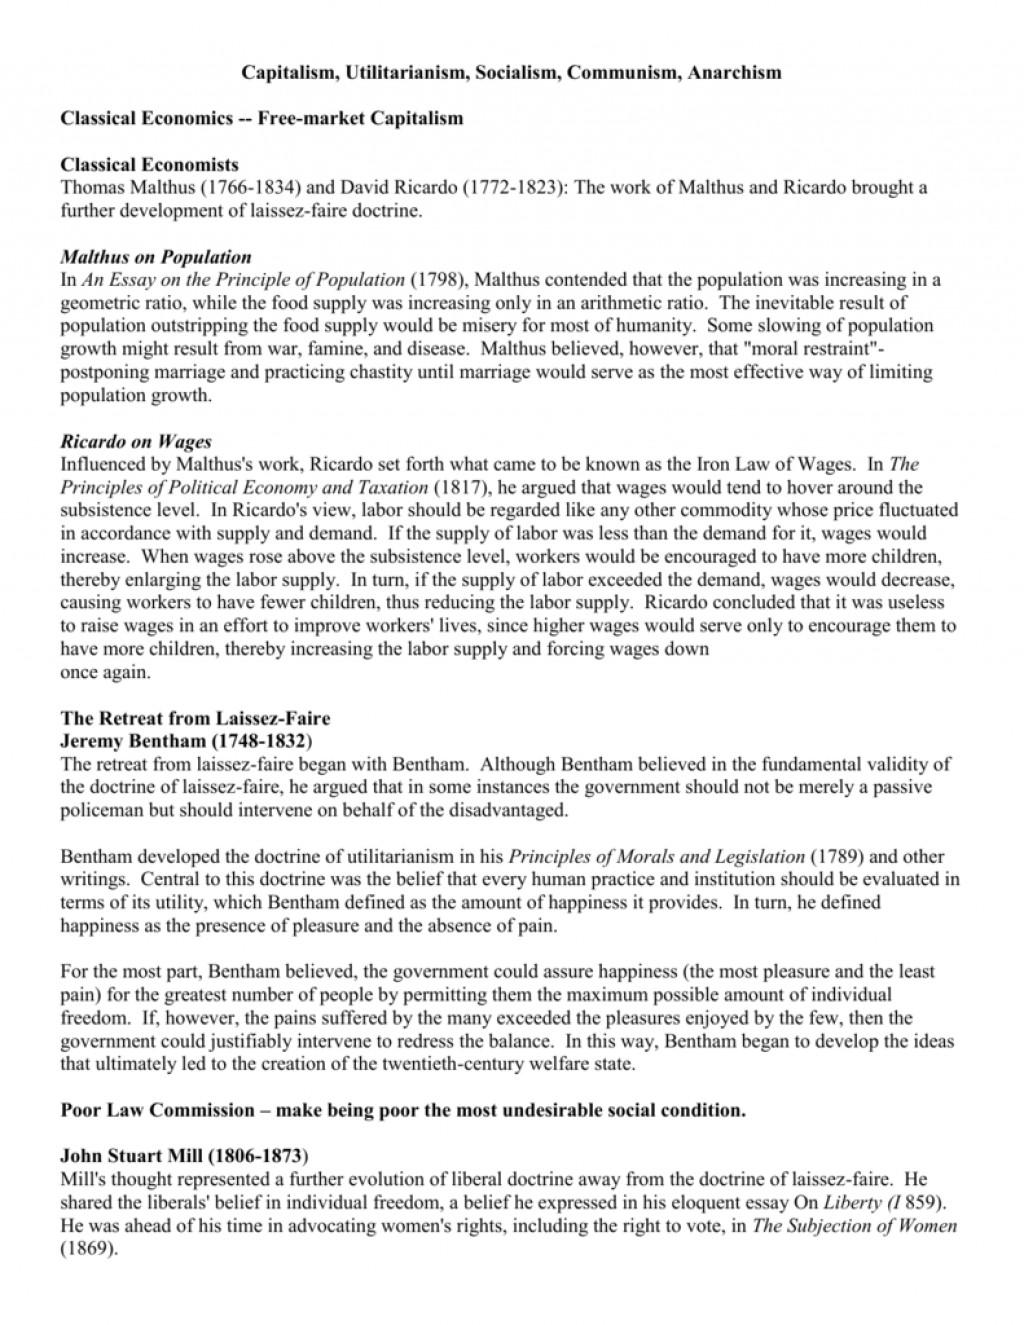 002 Essay Example Capitalism 008007925 1 Breathtaking Topics Question Pdf Large